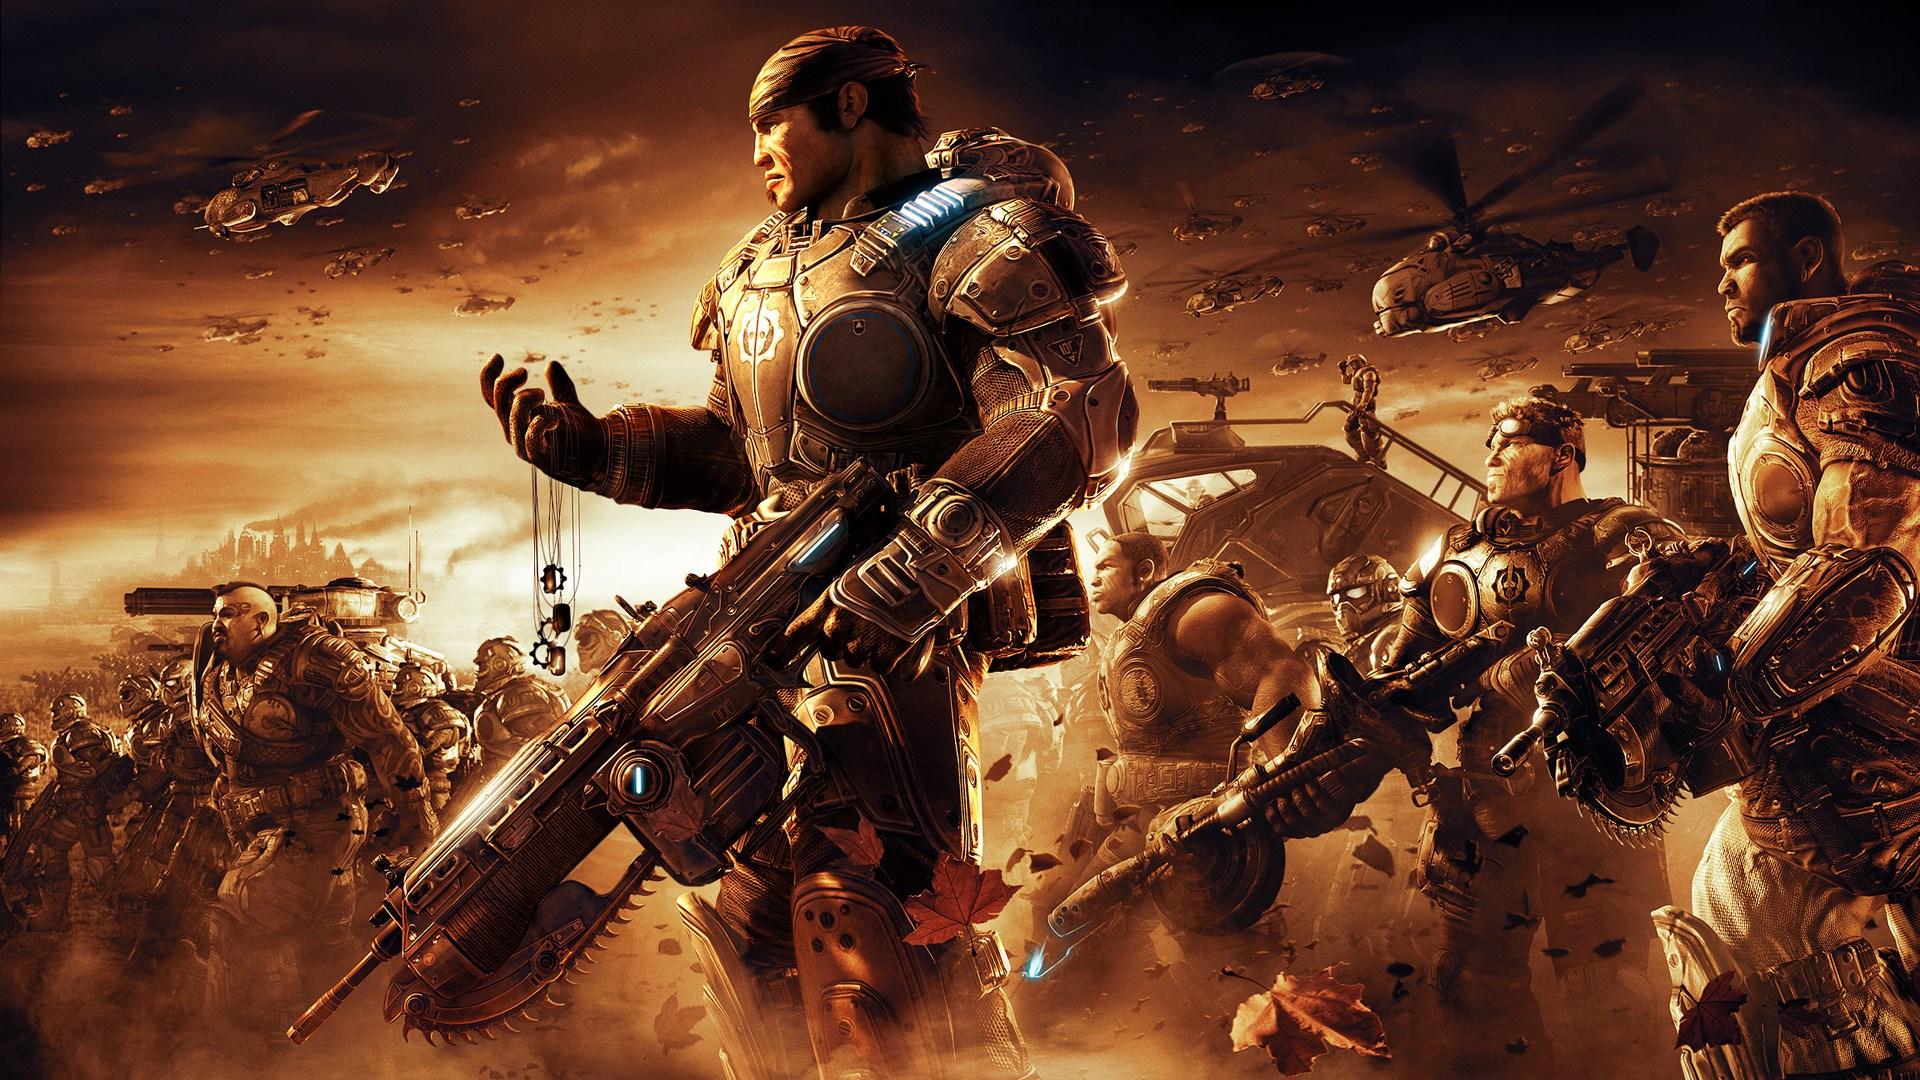 Gears of War 2 matchmaking liste over gratis mobile Dating Sites